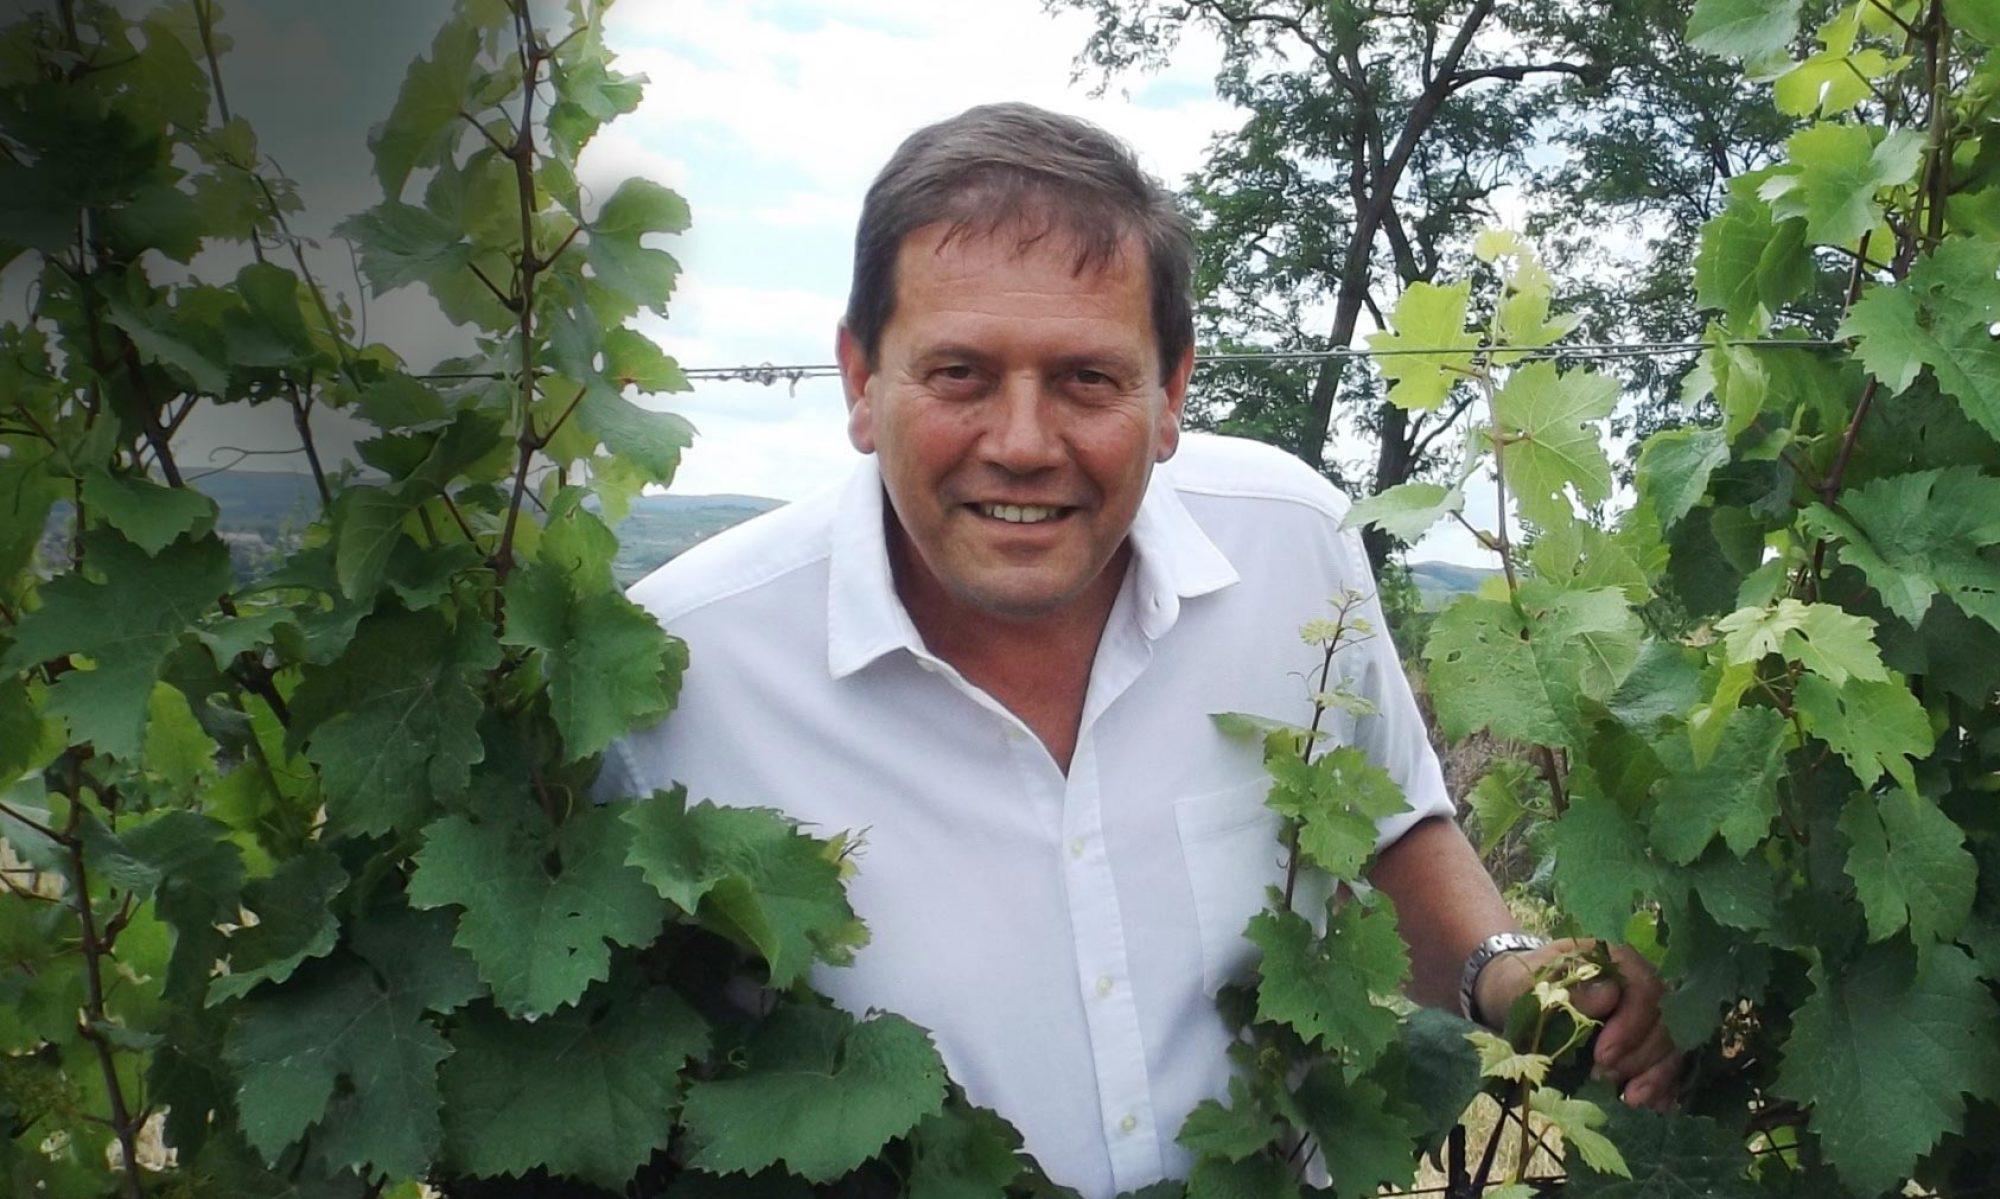 Weingut am Wechselberg Inh. Rudolf Völker